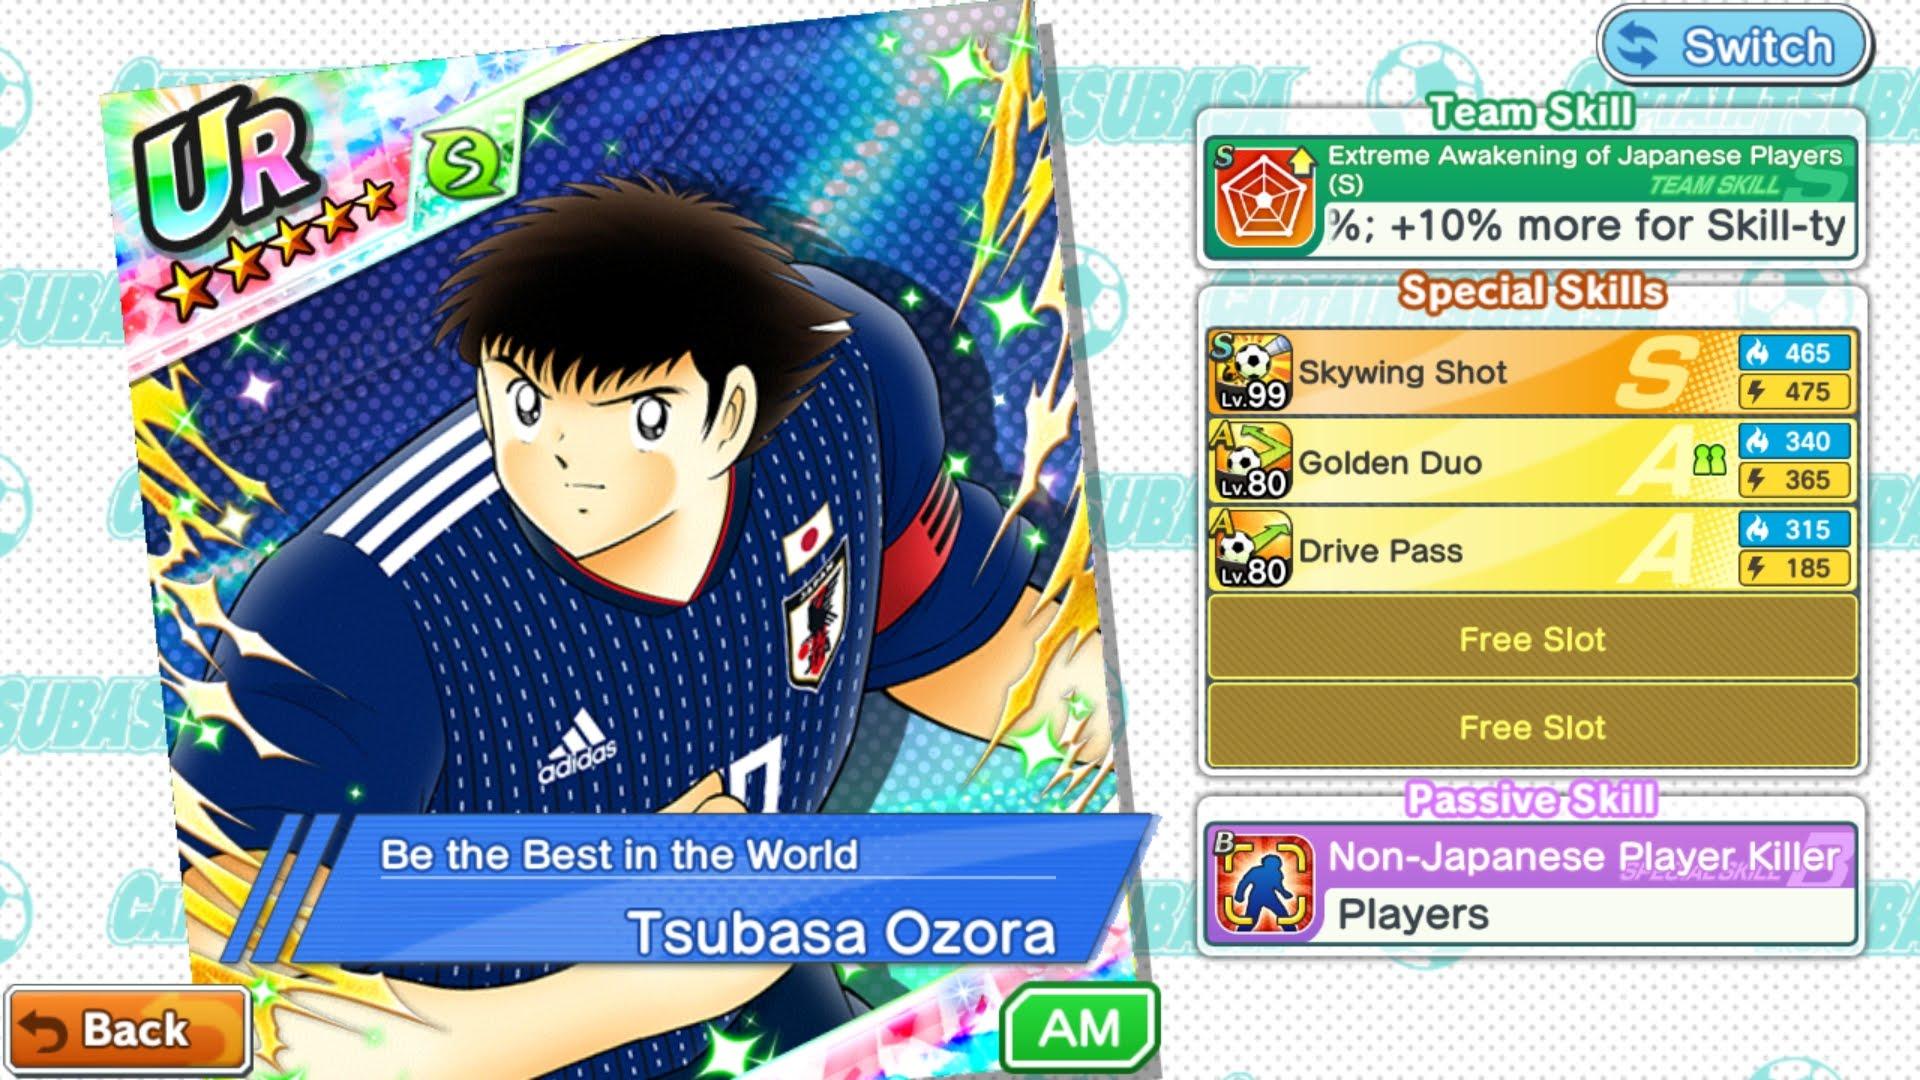 Captain Tsubasa: Dream Team – Tuyển Nhật phiên bản World Cup 2018 đáng sợ ra sao?